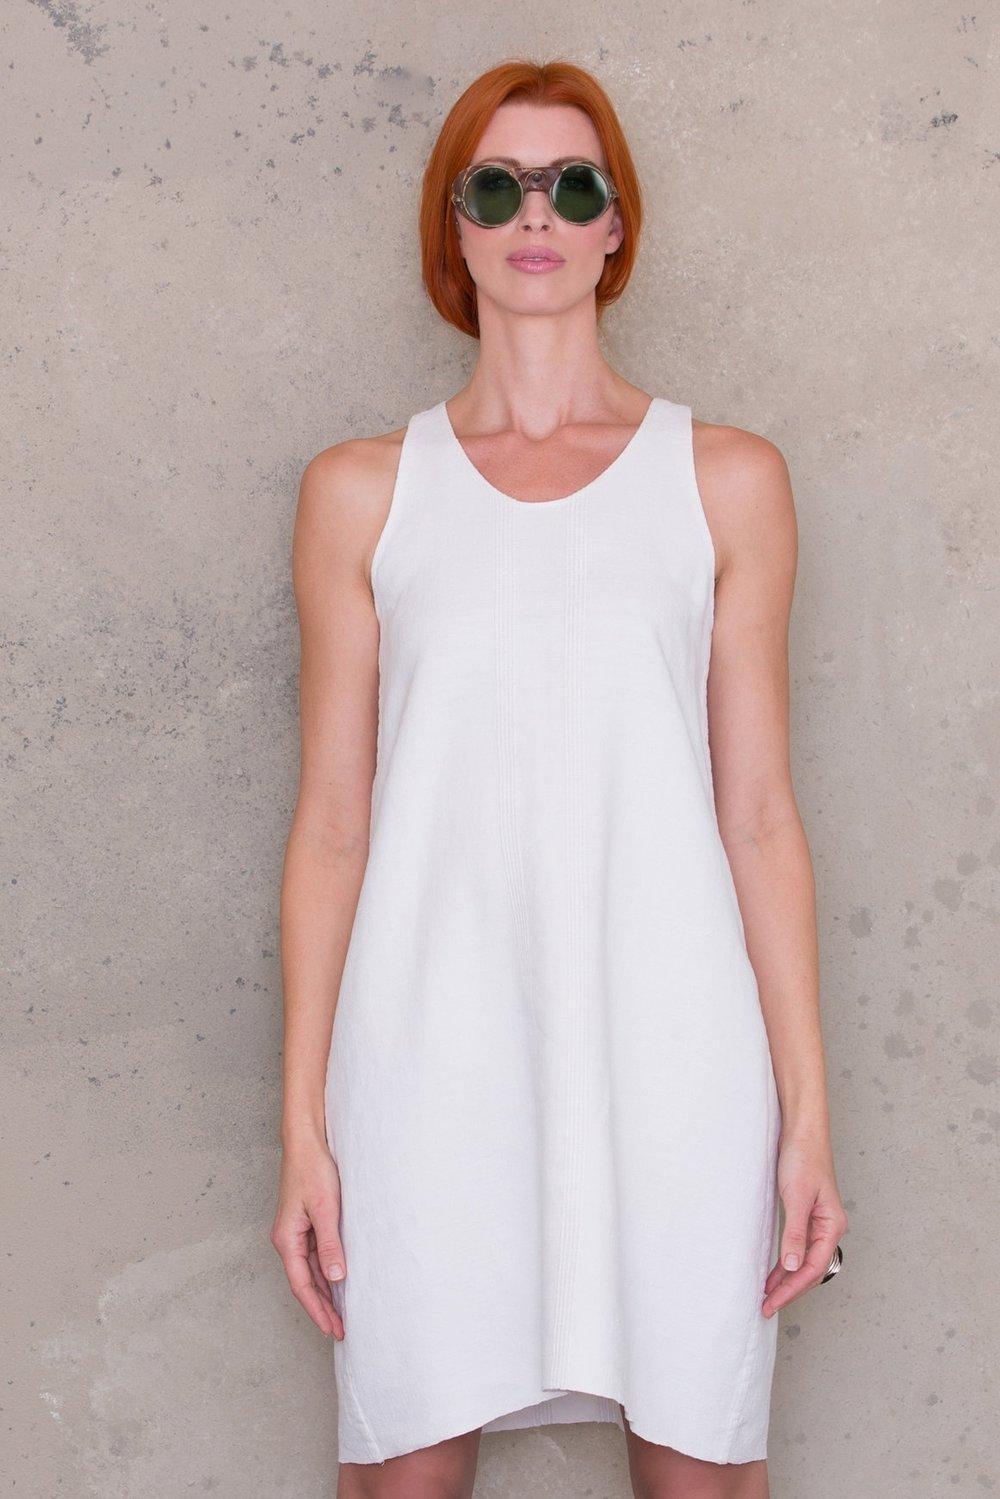 Ann Normandy Design Slip Dress Sewing Pattern - Photo by Steve Ragland